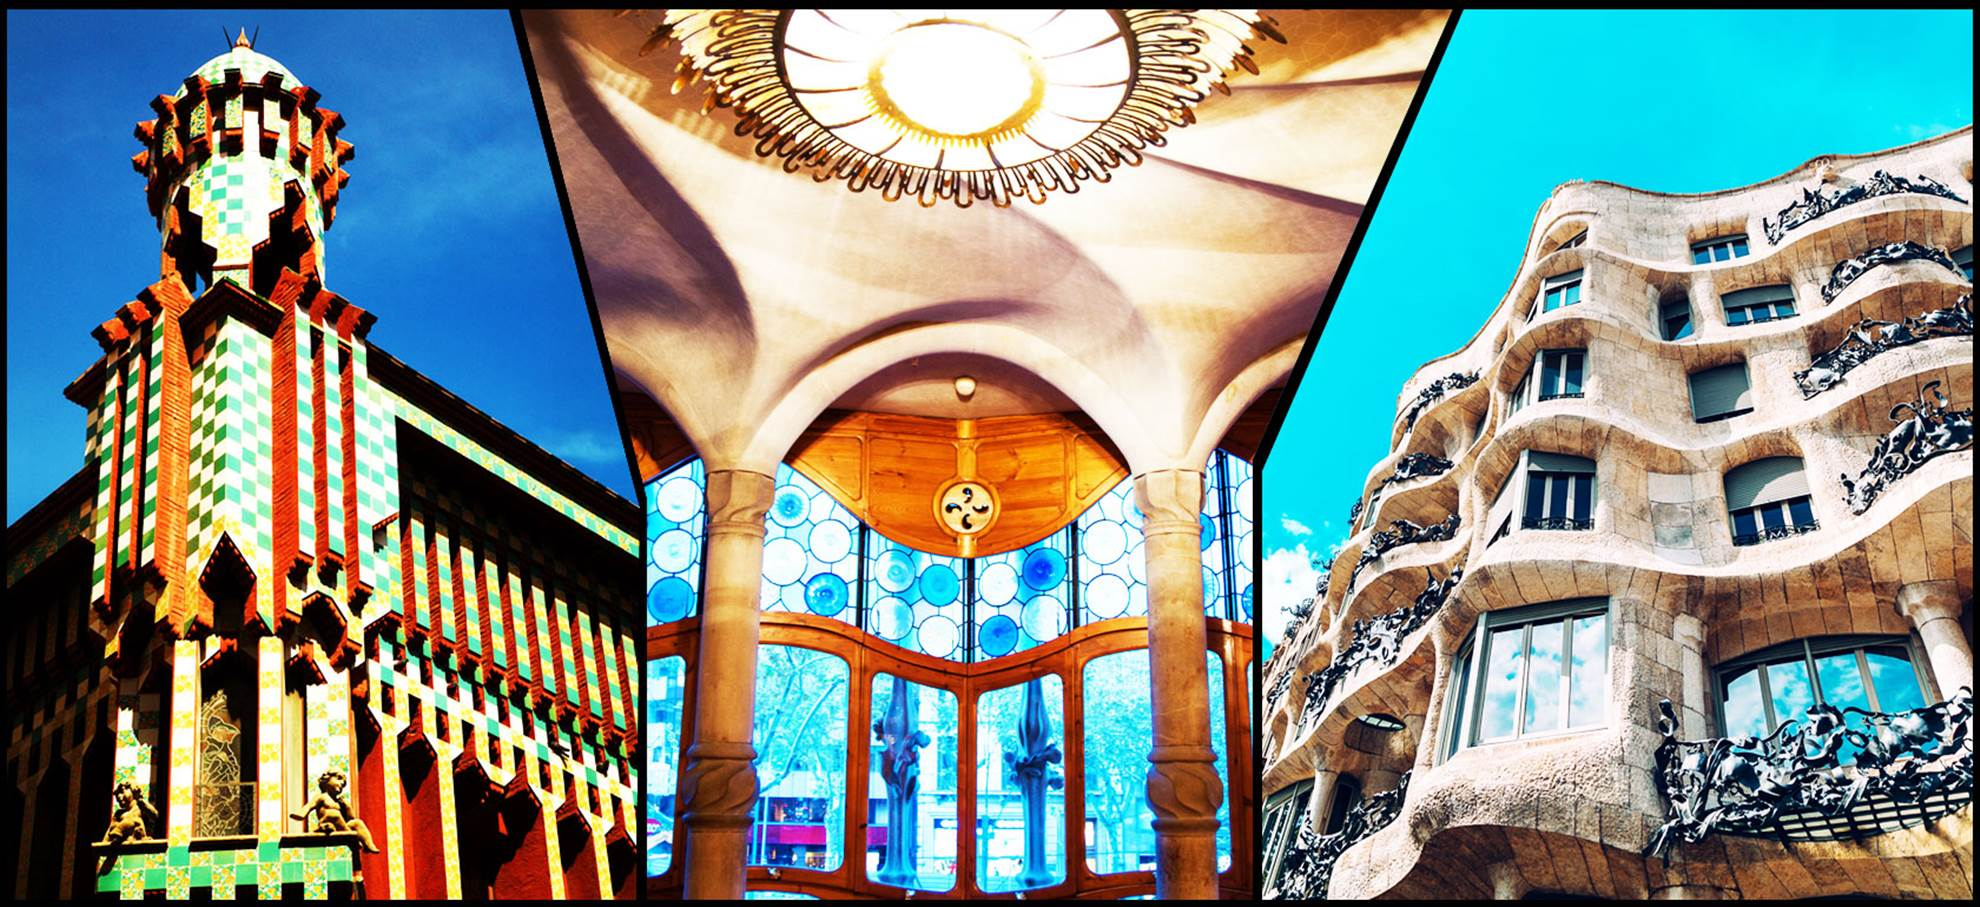 Stijl Van Gaudi.Gaudi S Super Combi Direct Toegang Tot Casa Battlo Mila